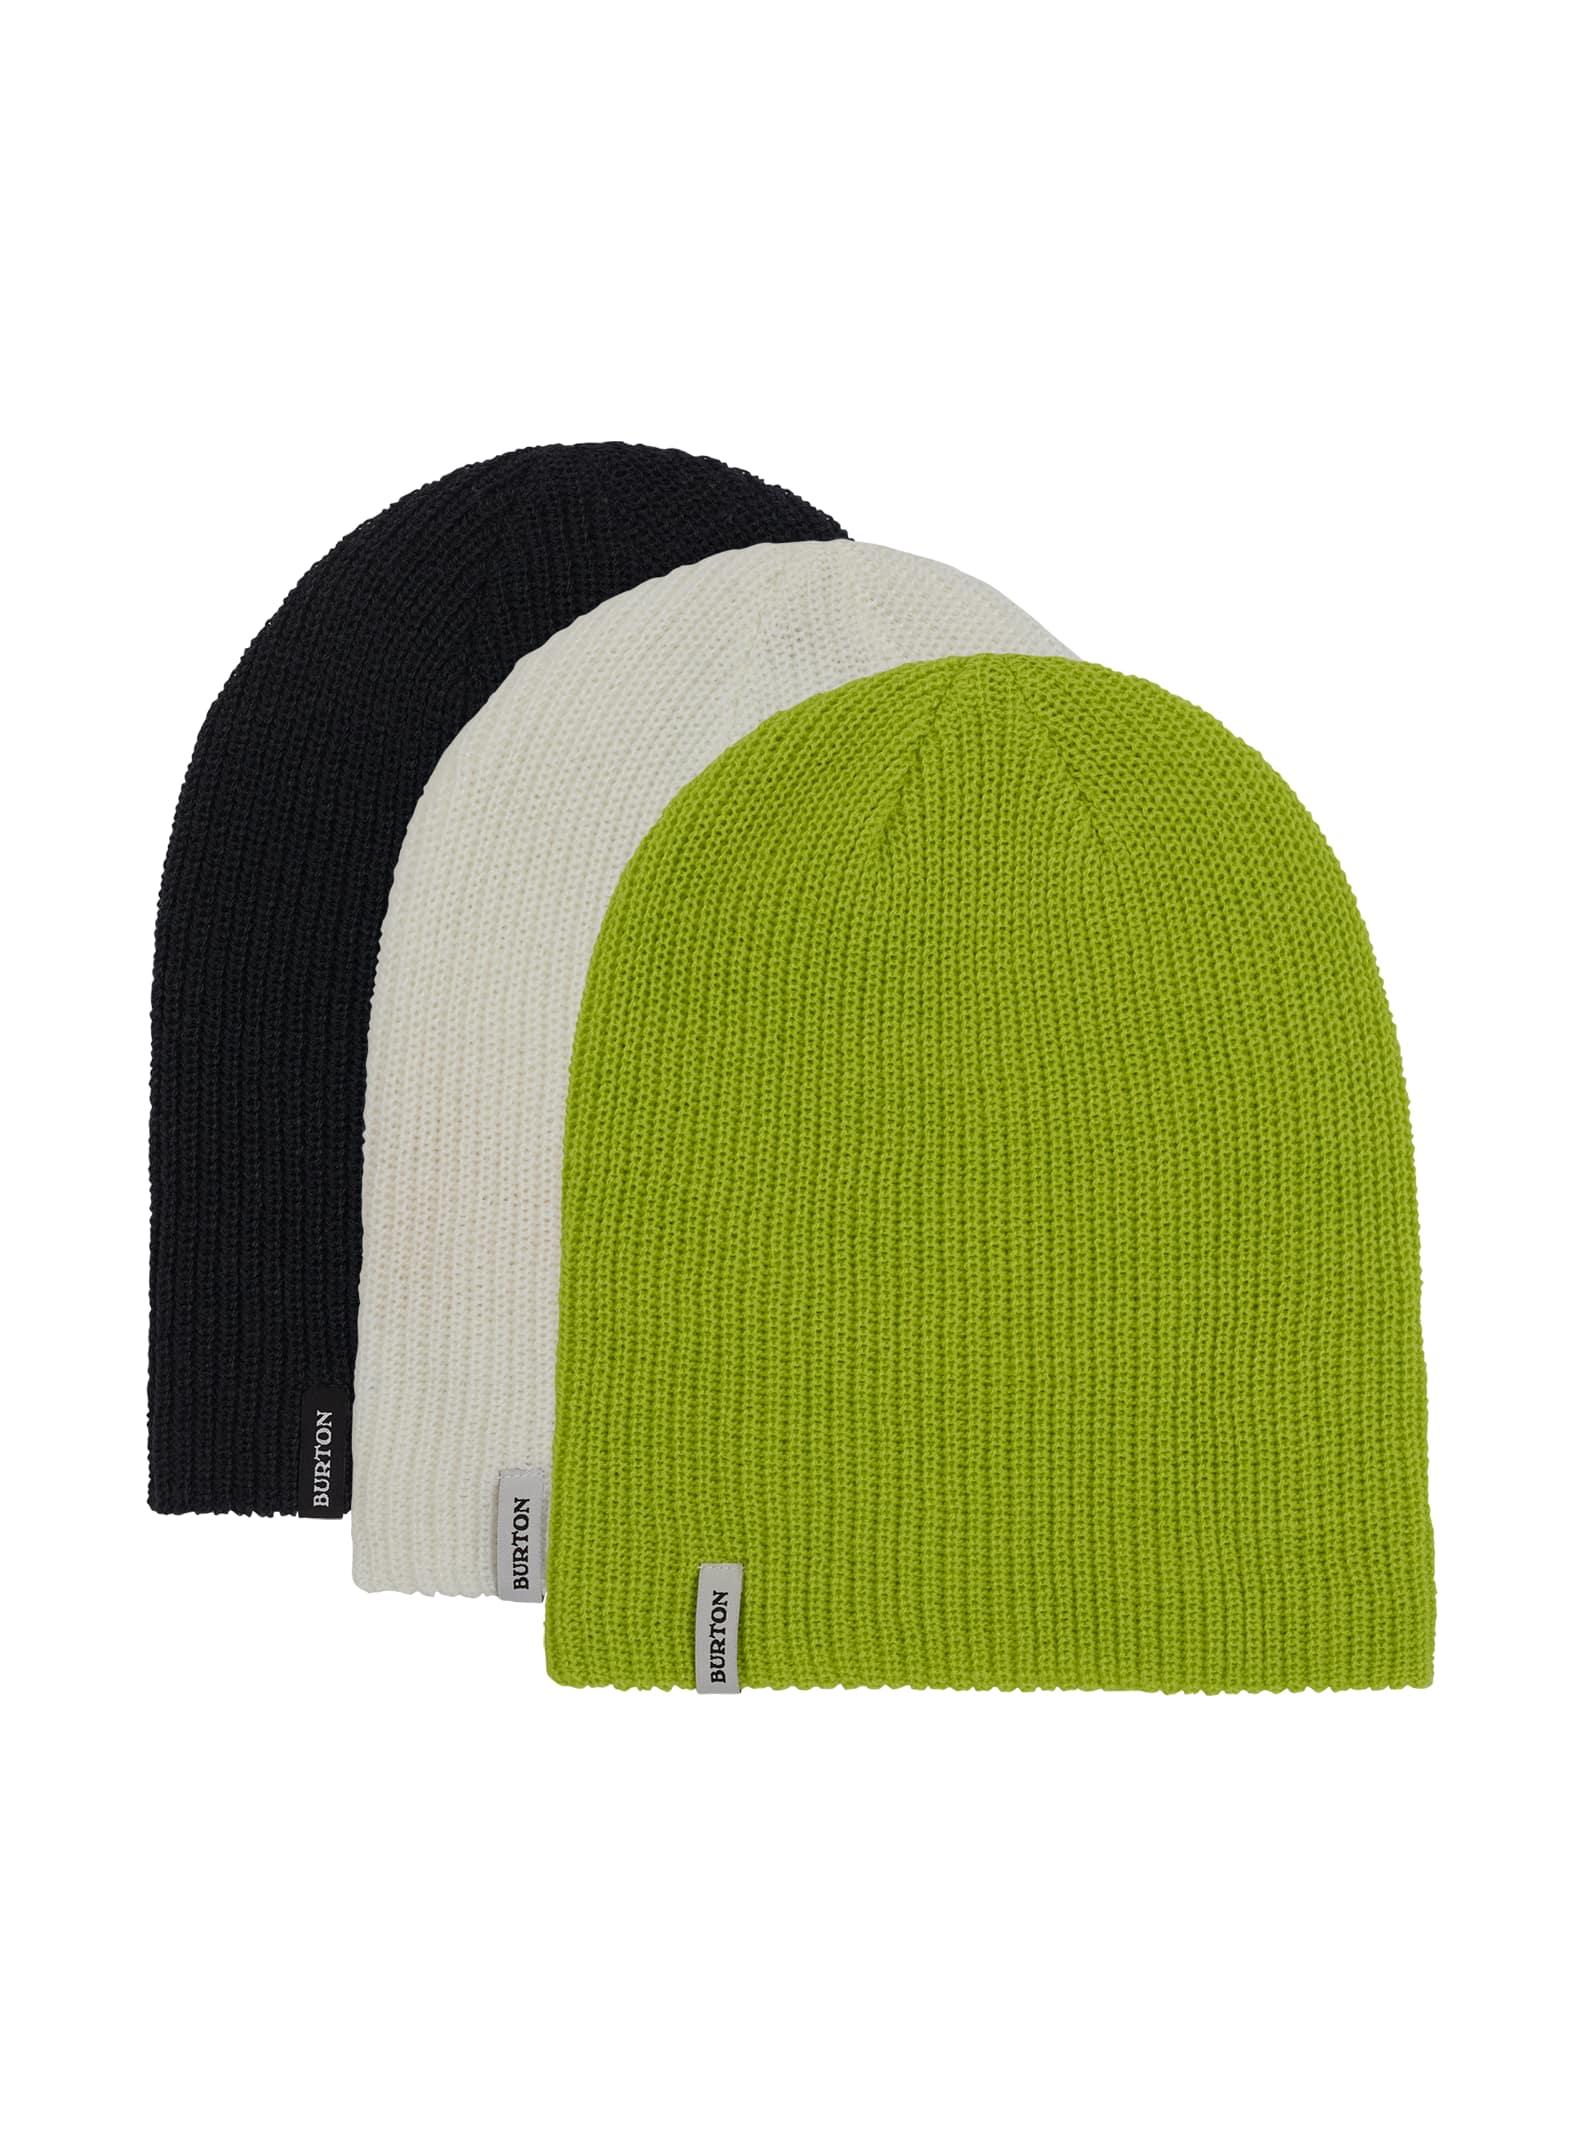 92289ab88fc366 Men's Hats & Beanies | Burton Snowboards